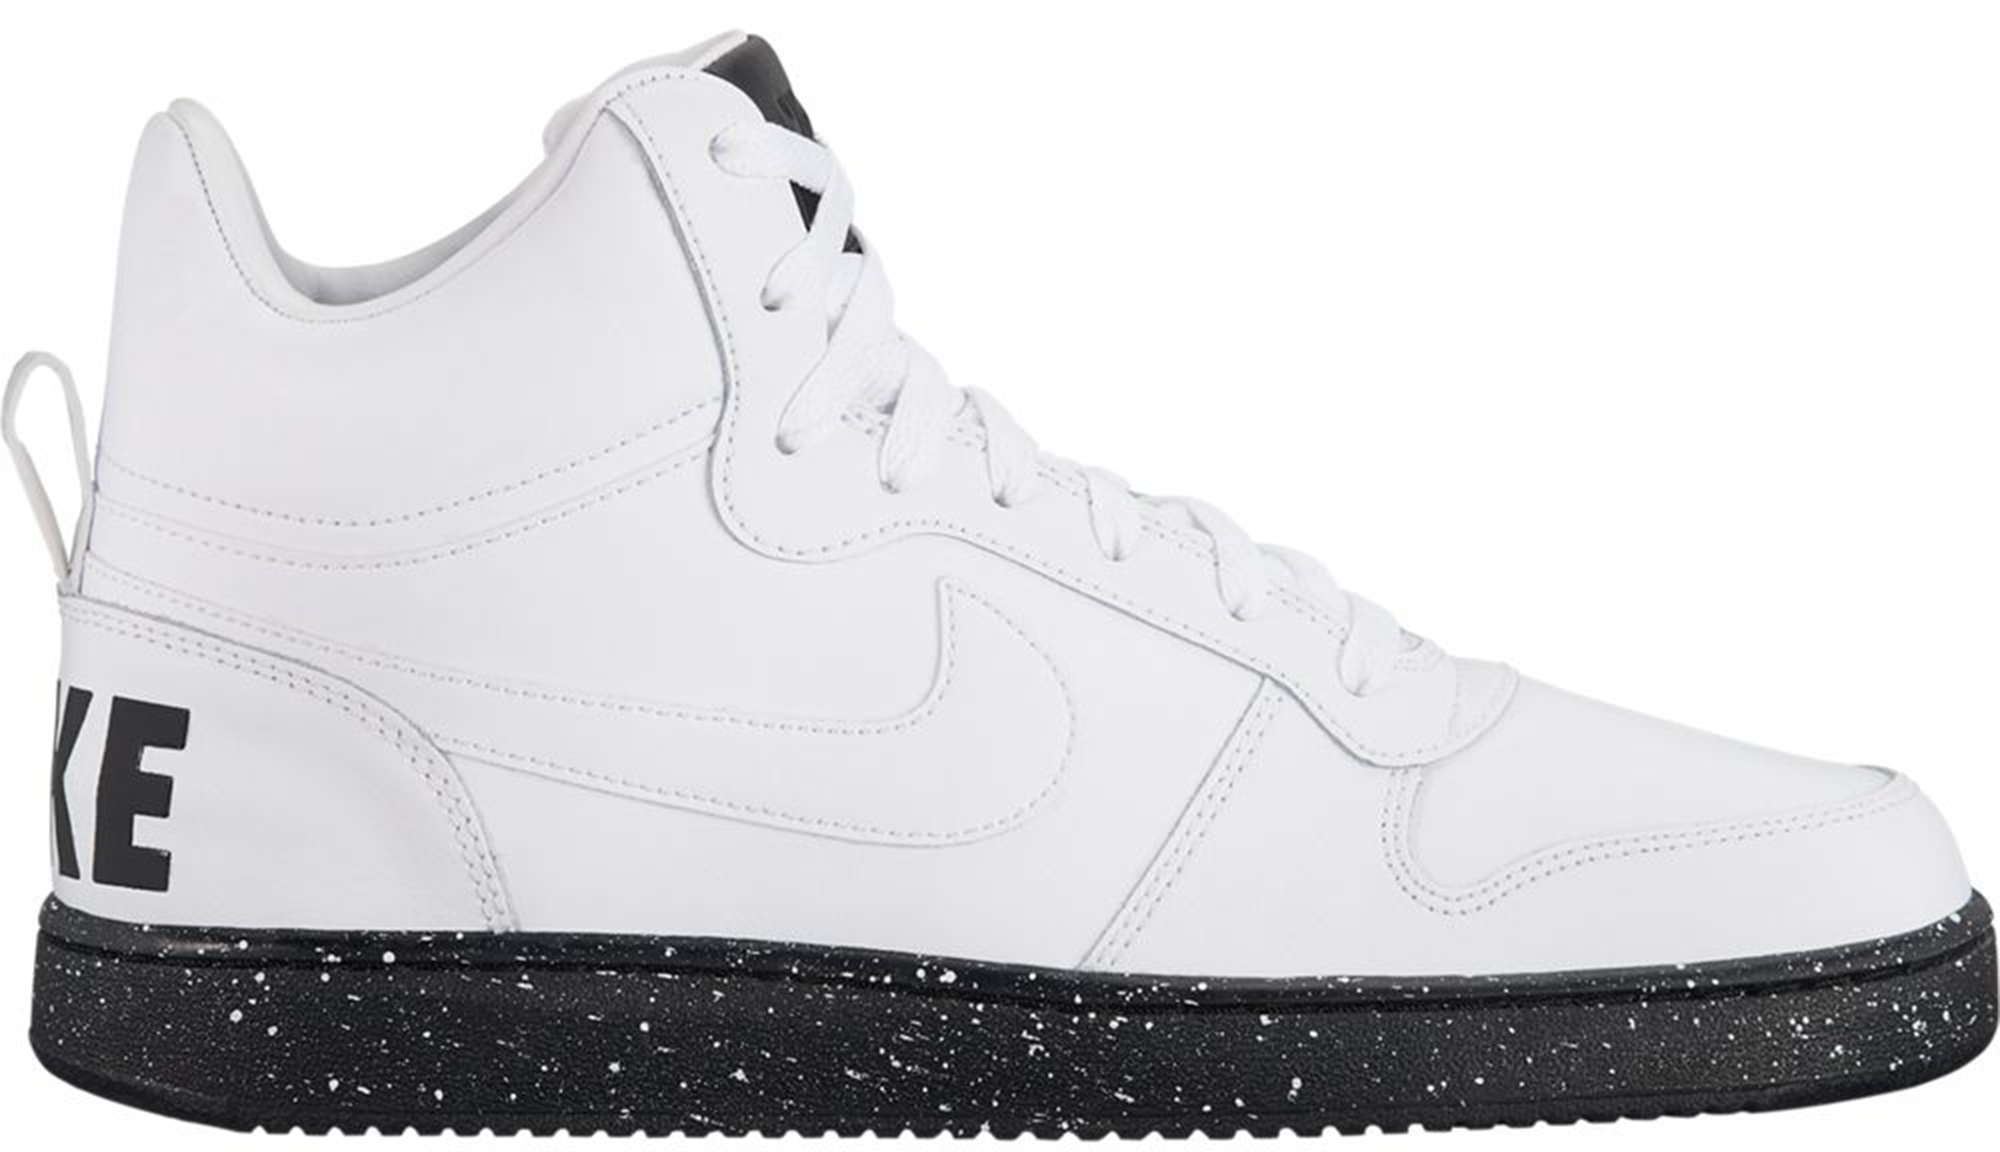 Nike Court Borough Mid White Black Speckled Sole